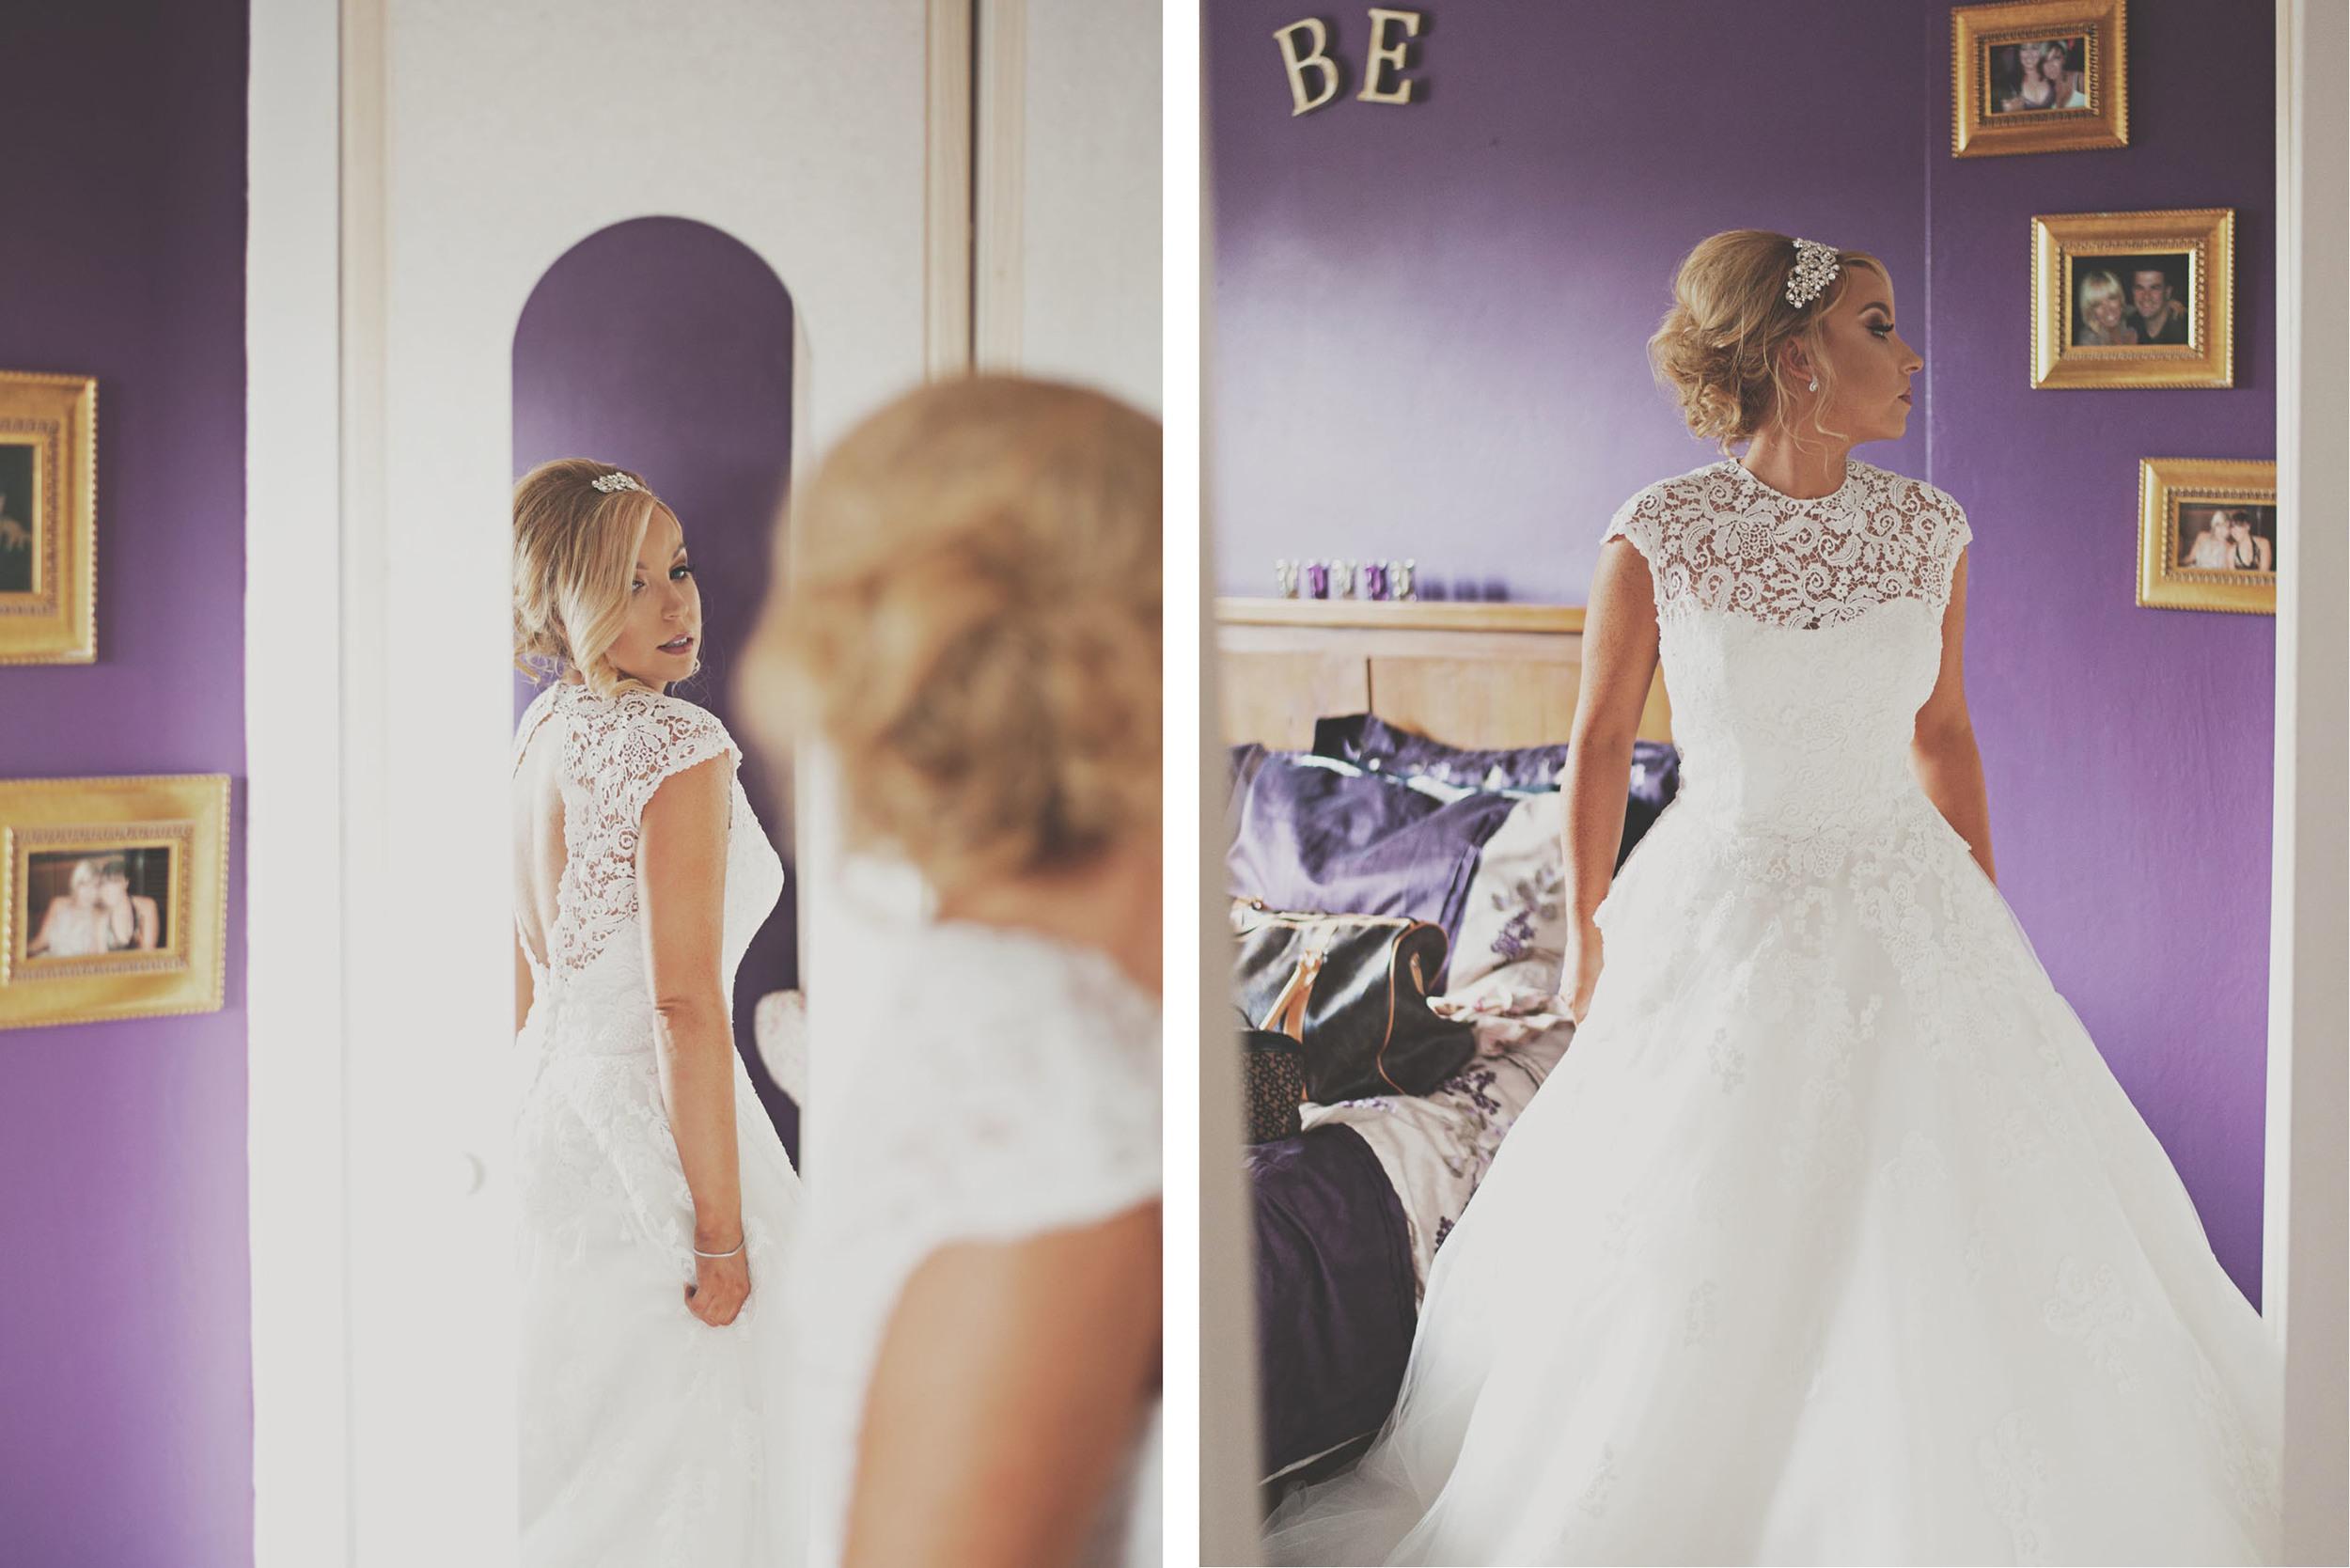 Emma & Bobby's Castleknock Wedding 023.jpg